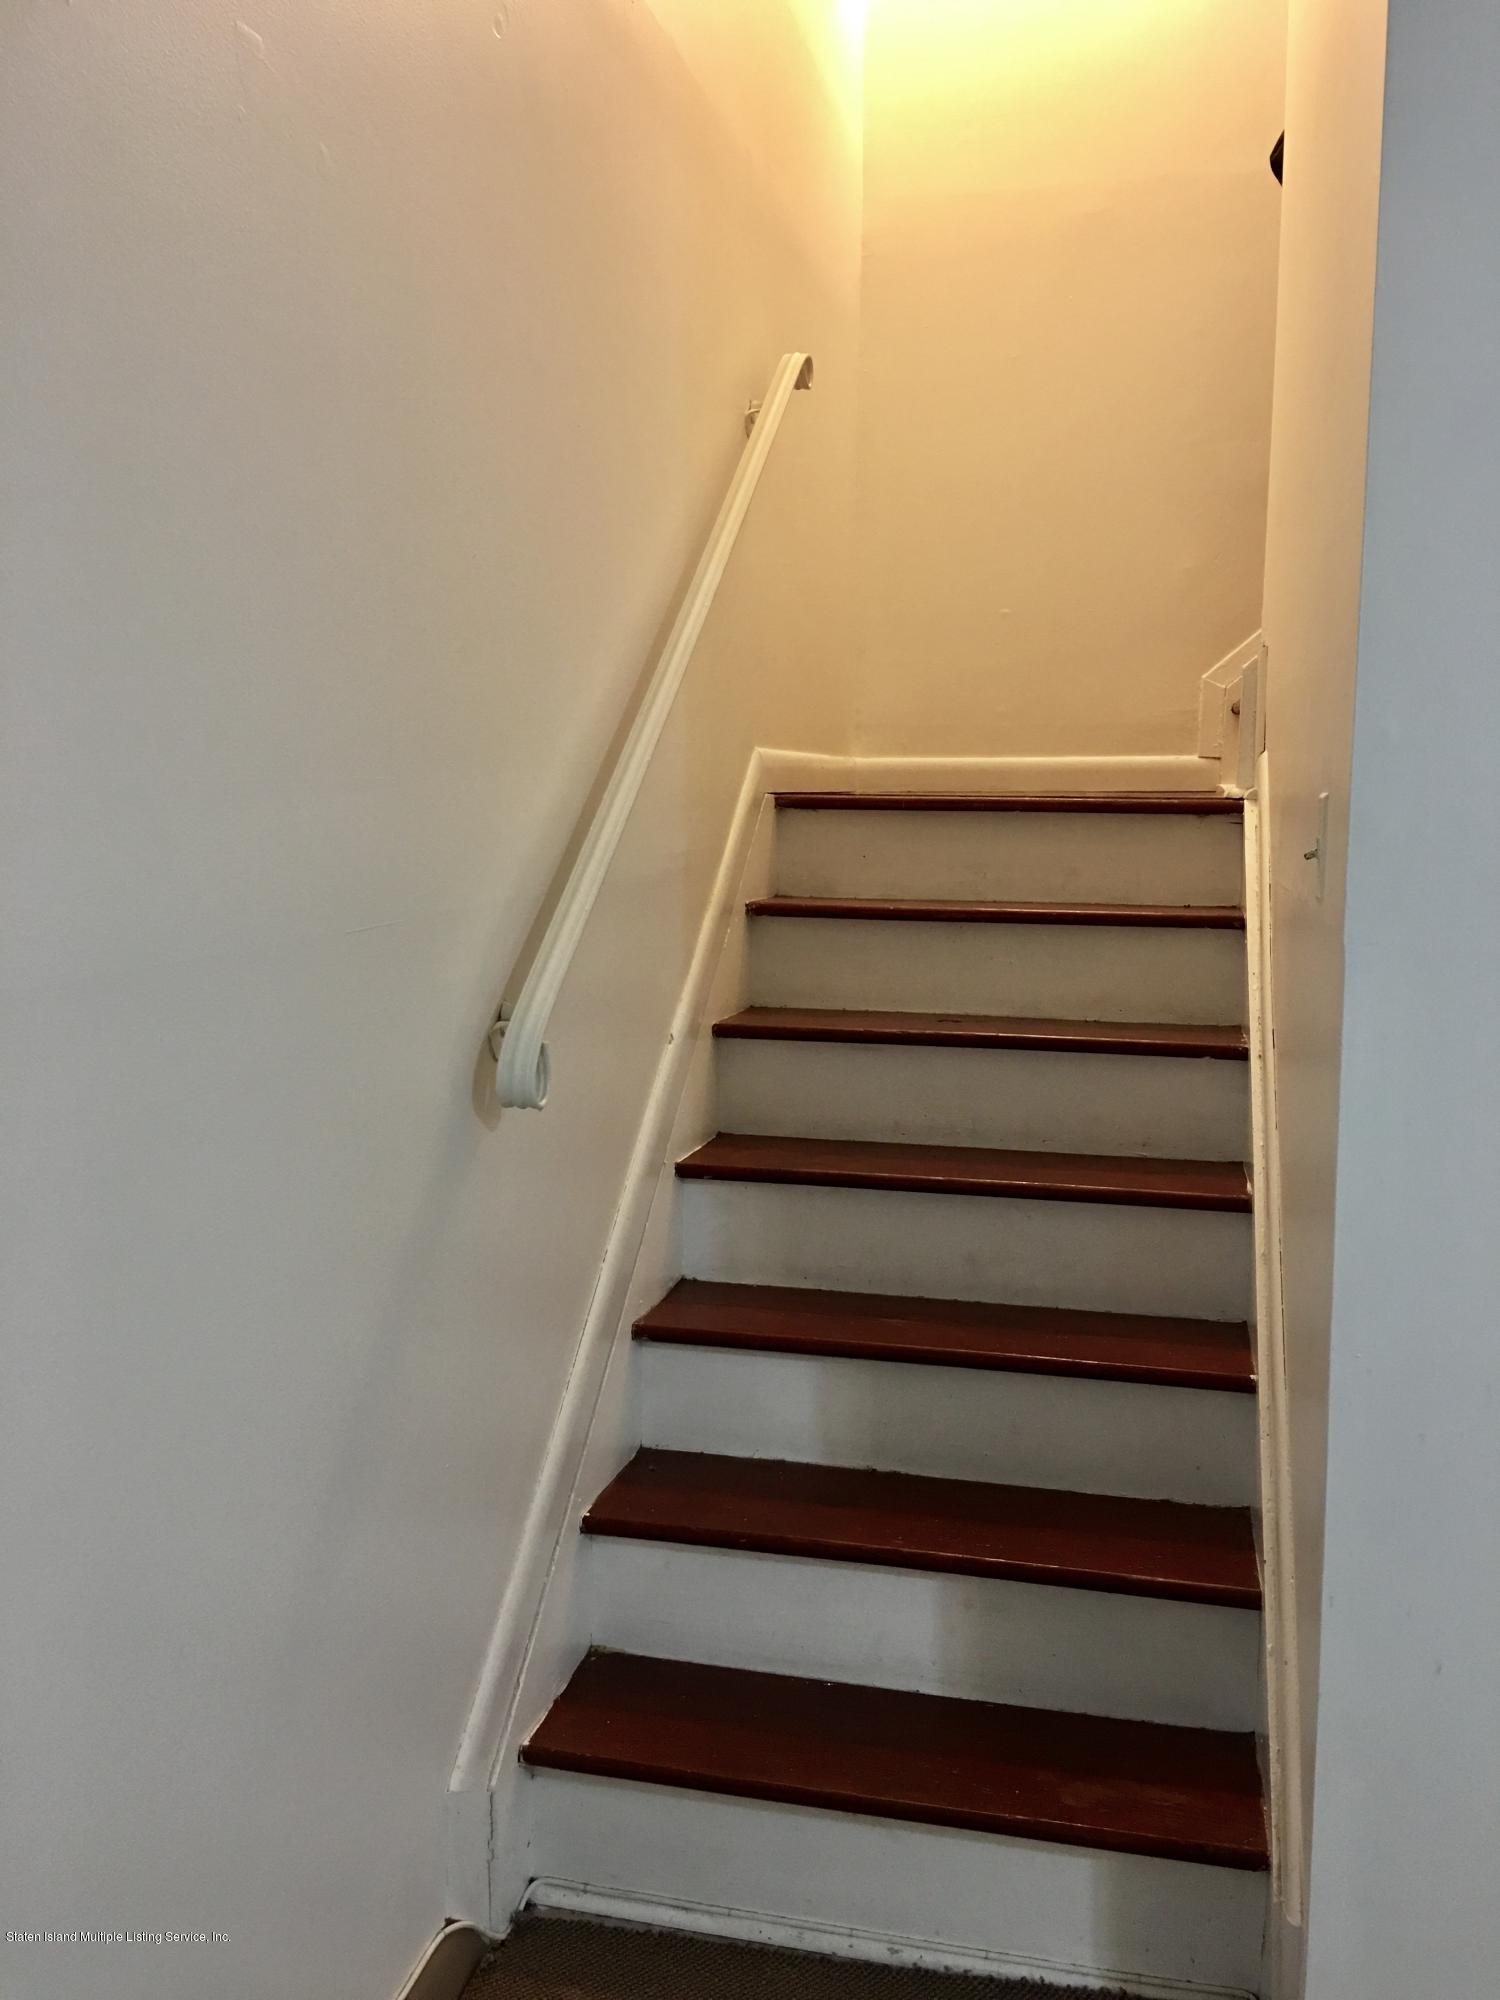 142 Kiswick Street,Staten Island,New York,10306,United States,2 Bedrooms Bedrooms,5 Rooms Rooms,2 BathroomsBathrooms,Res-Rental,Kiswick,1128086